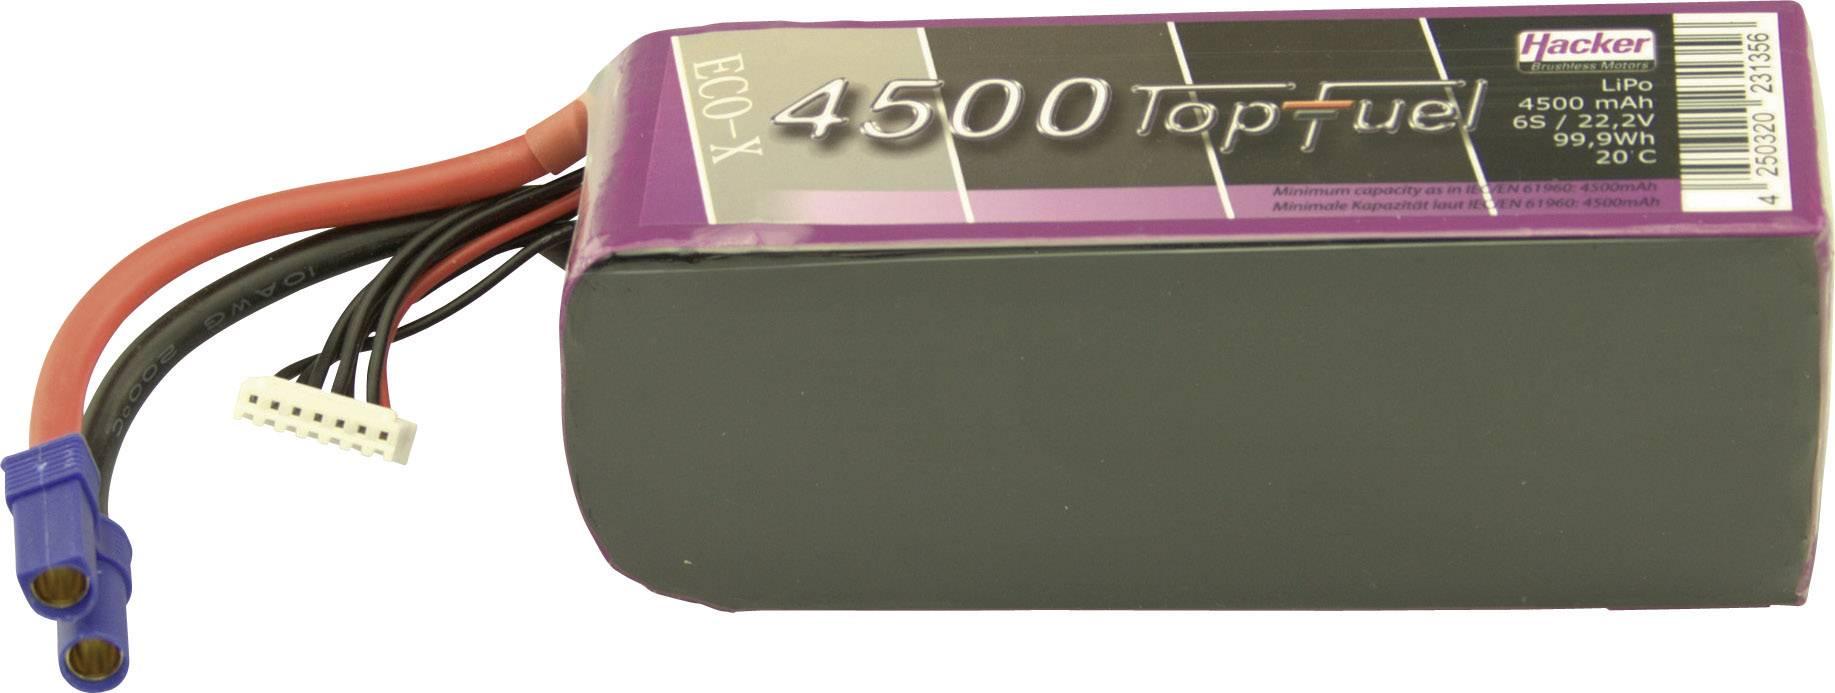 Akupack Li-Pol Hacker 34500631, 22.2 V, 4500 mAh